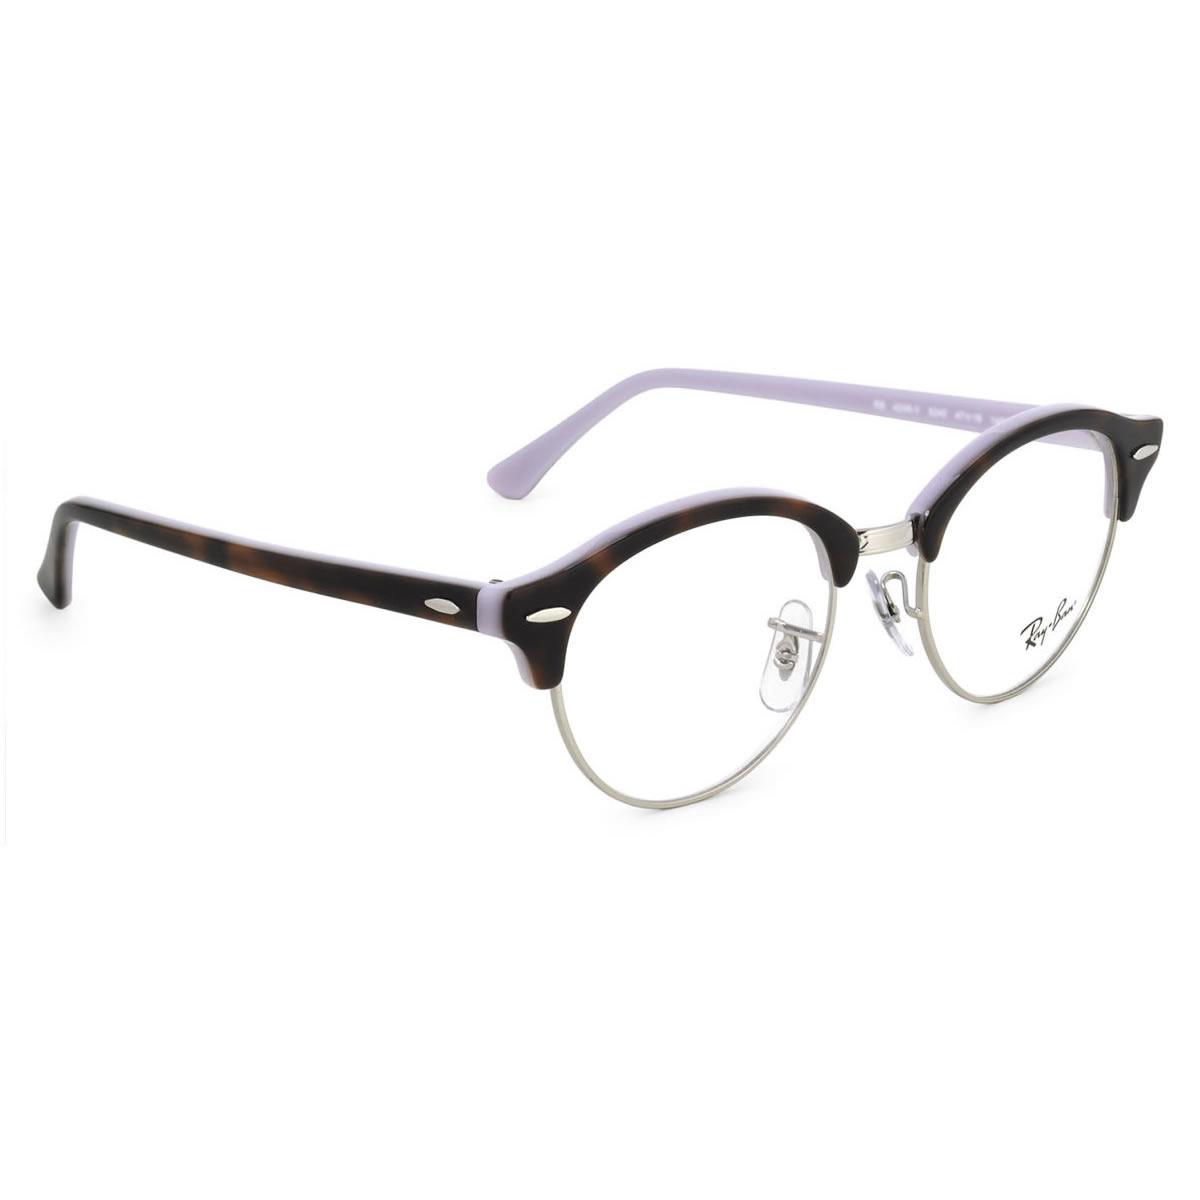 Optical Shop Thats | Rakuten Global Market: Point up to eight times ...